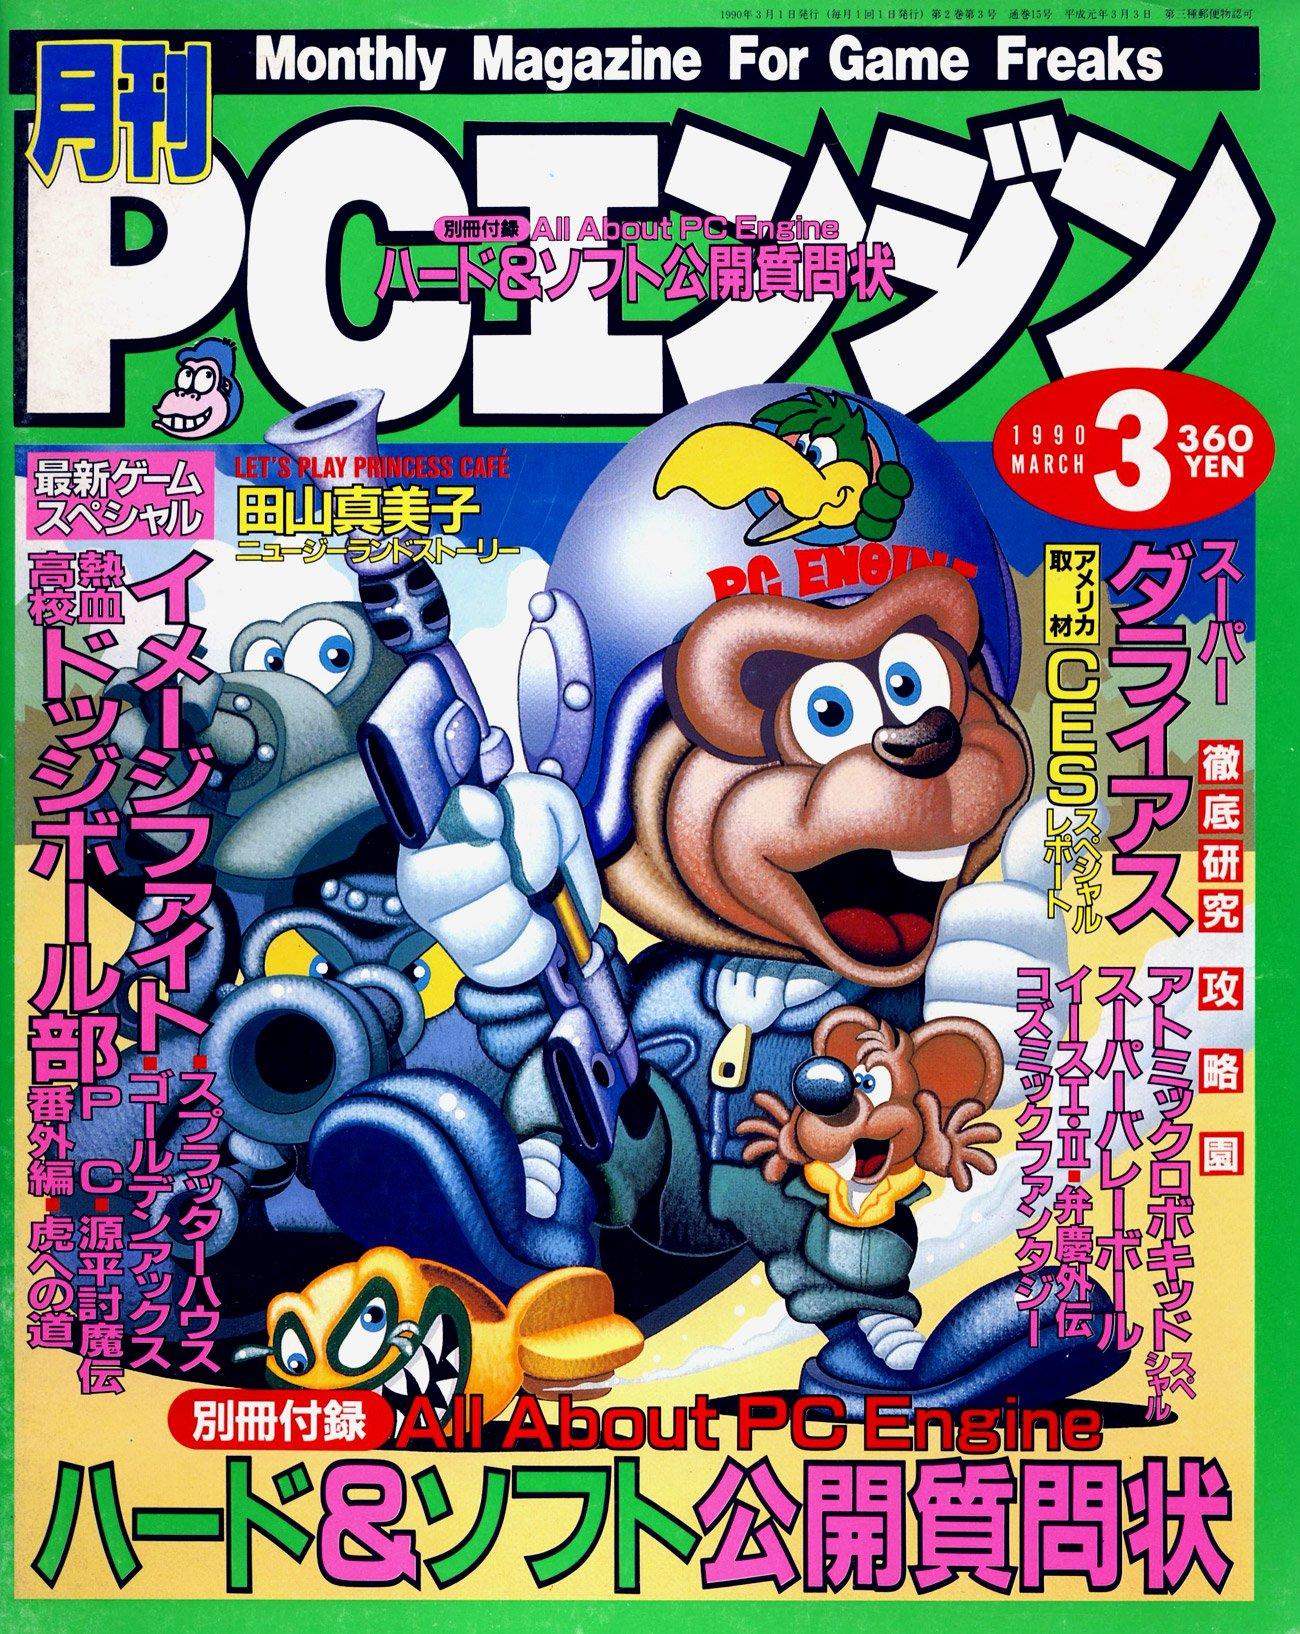 Gekkan PC Engine Issue 15 (March 1990)